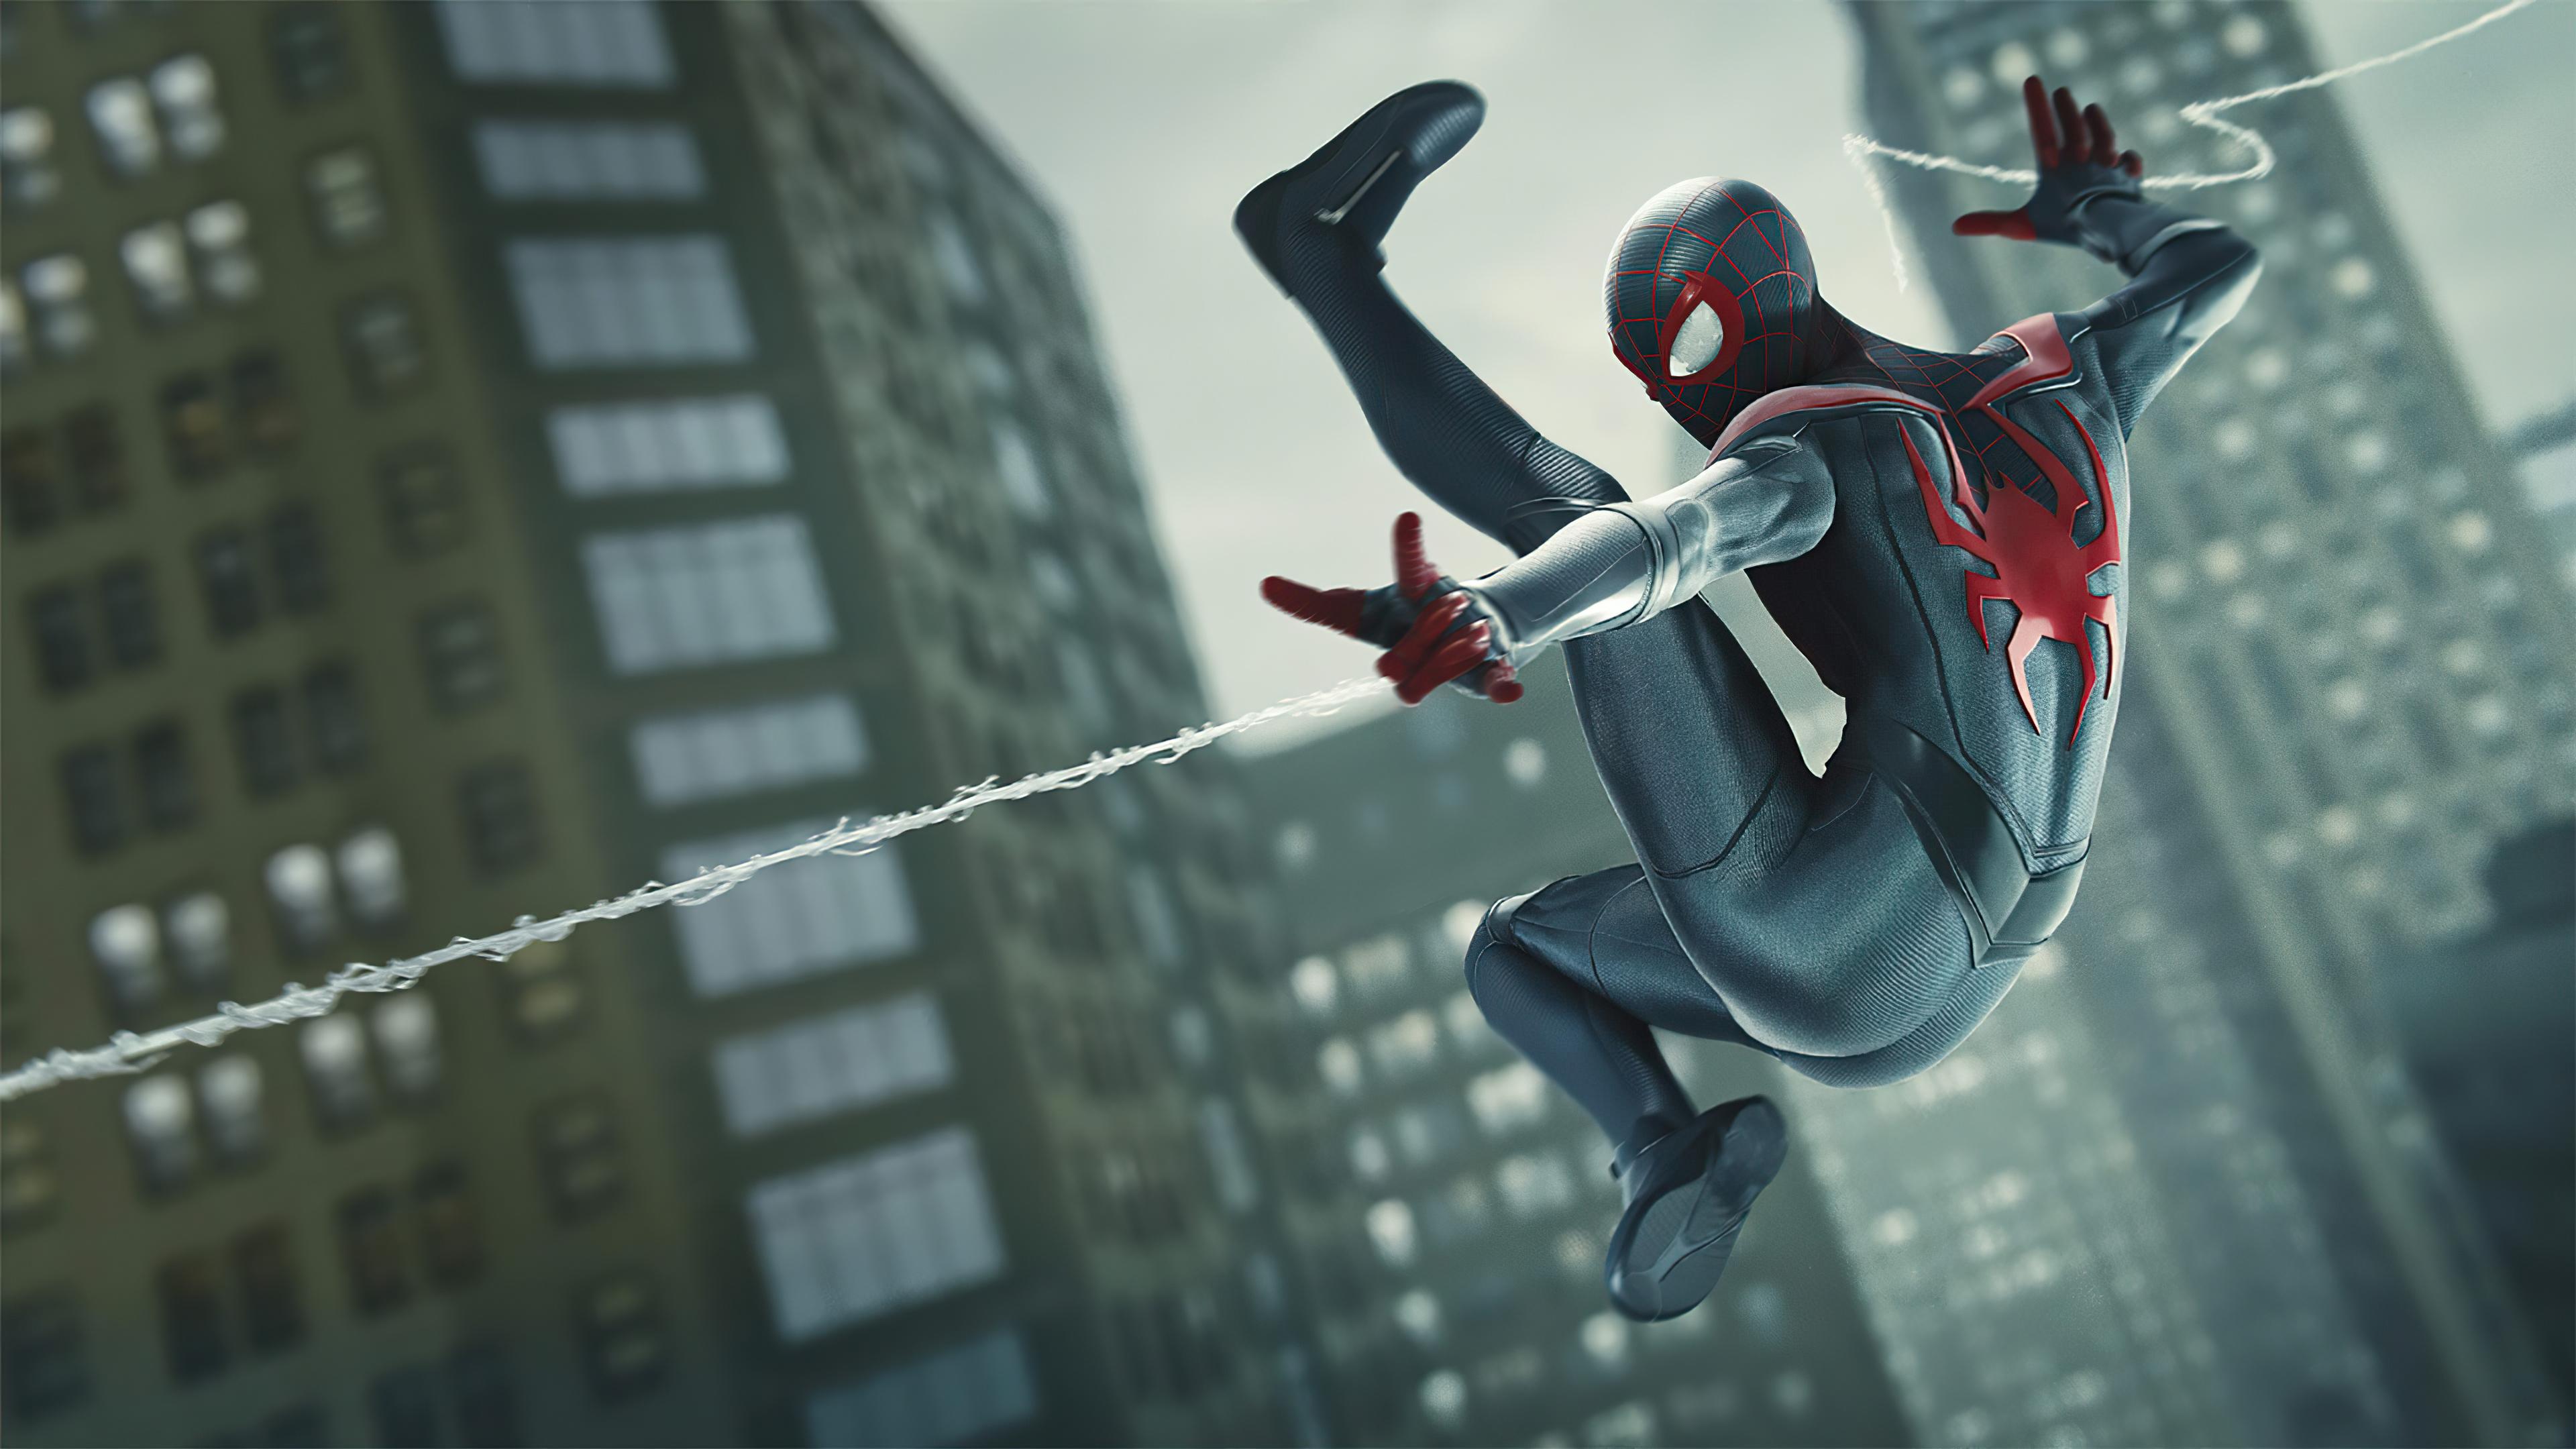 Spiderman Miles Morales Web Shooter Wallpaper, HD Games 4K ...